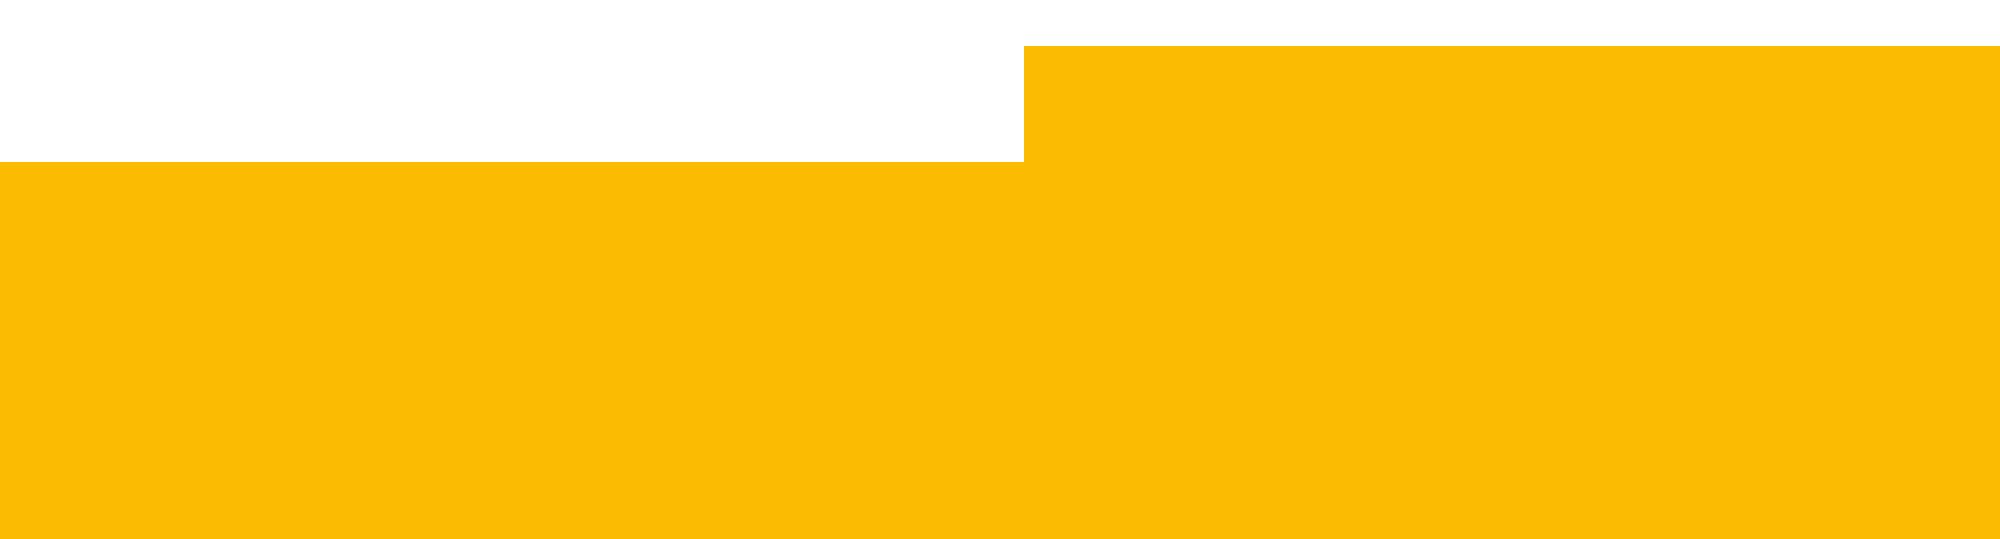 bandeau jaune haut maisons jb. Black Bedroom Furniture Sets. Home Design Ideas